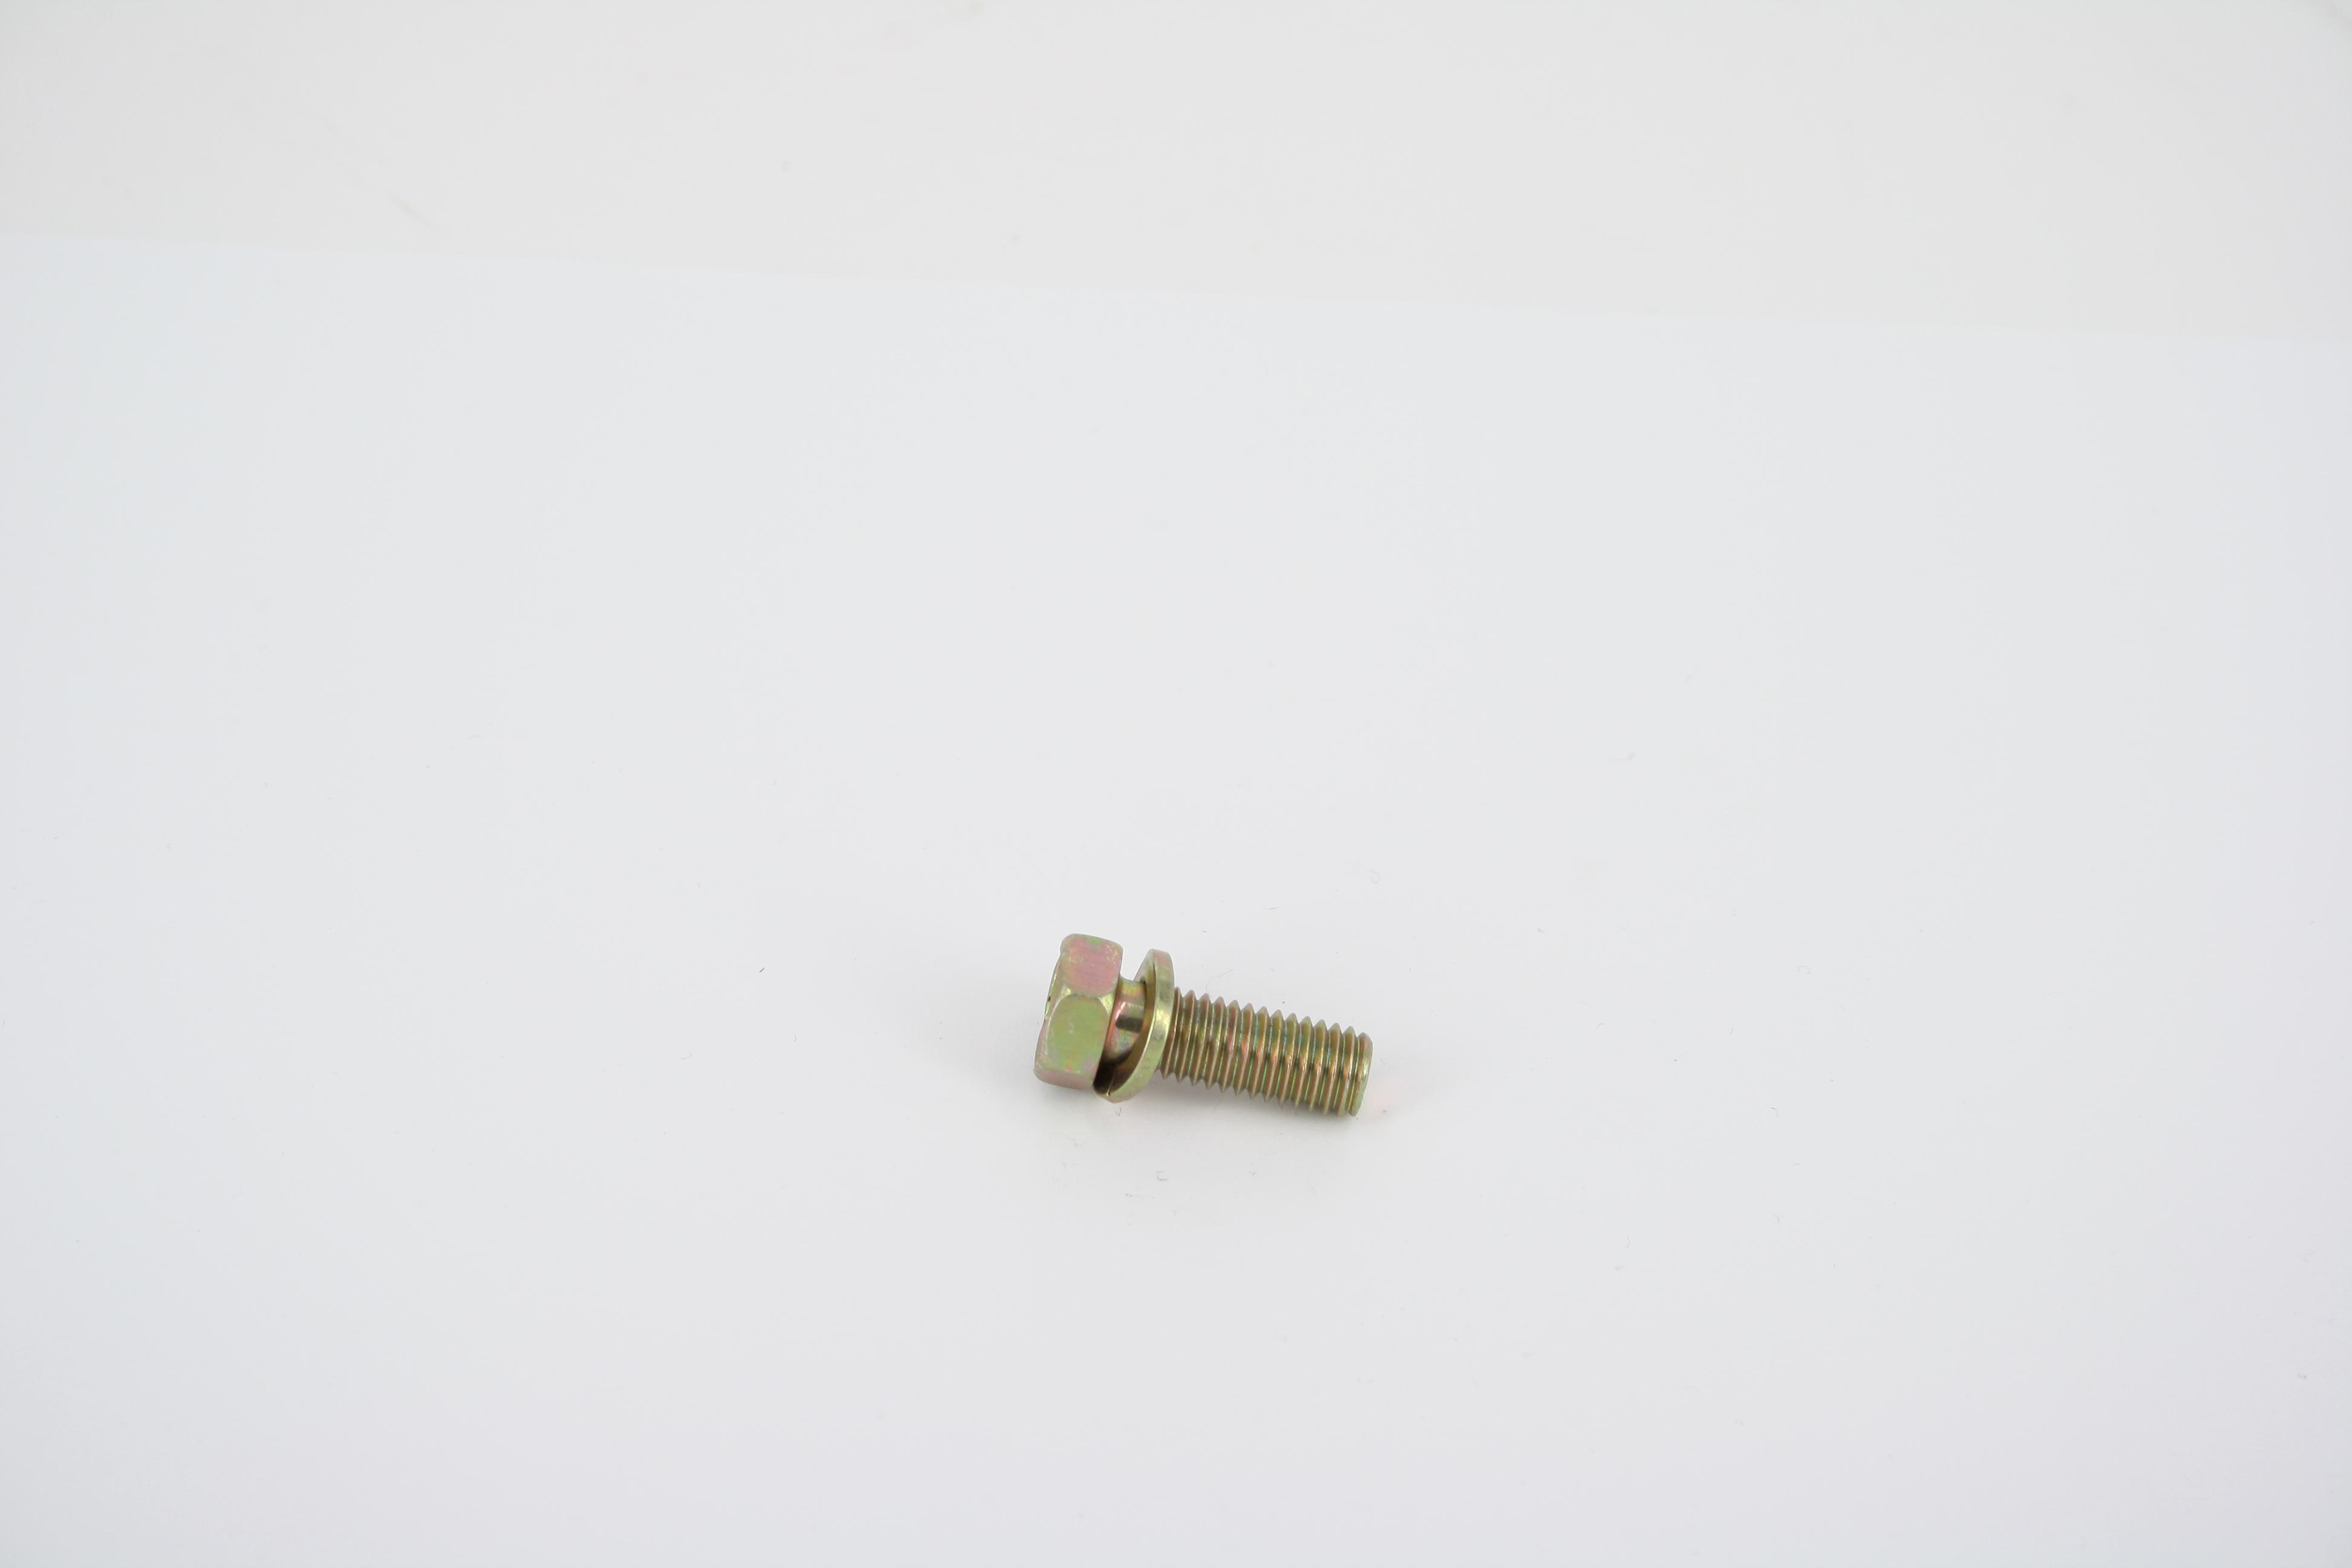 bolt M6x16- hex head w-washer